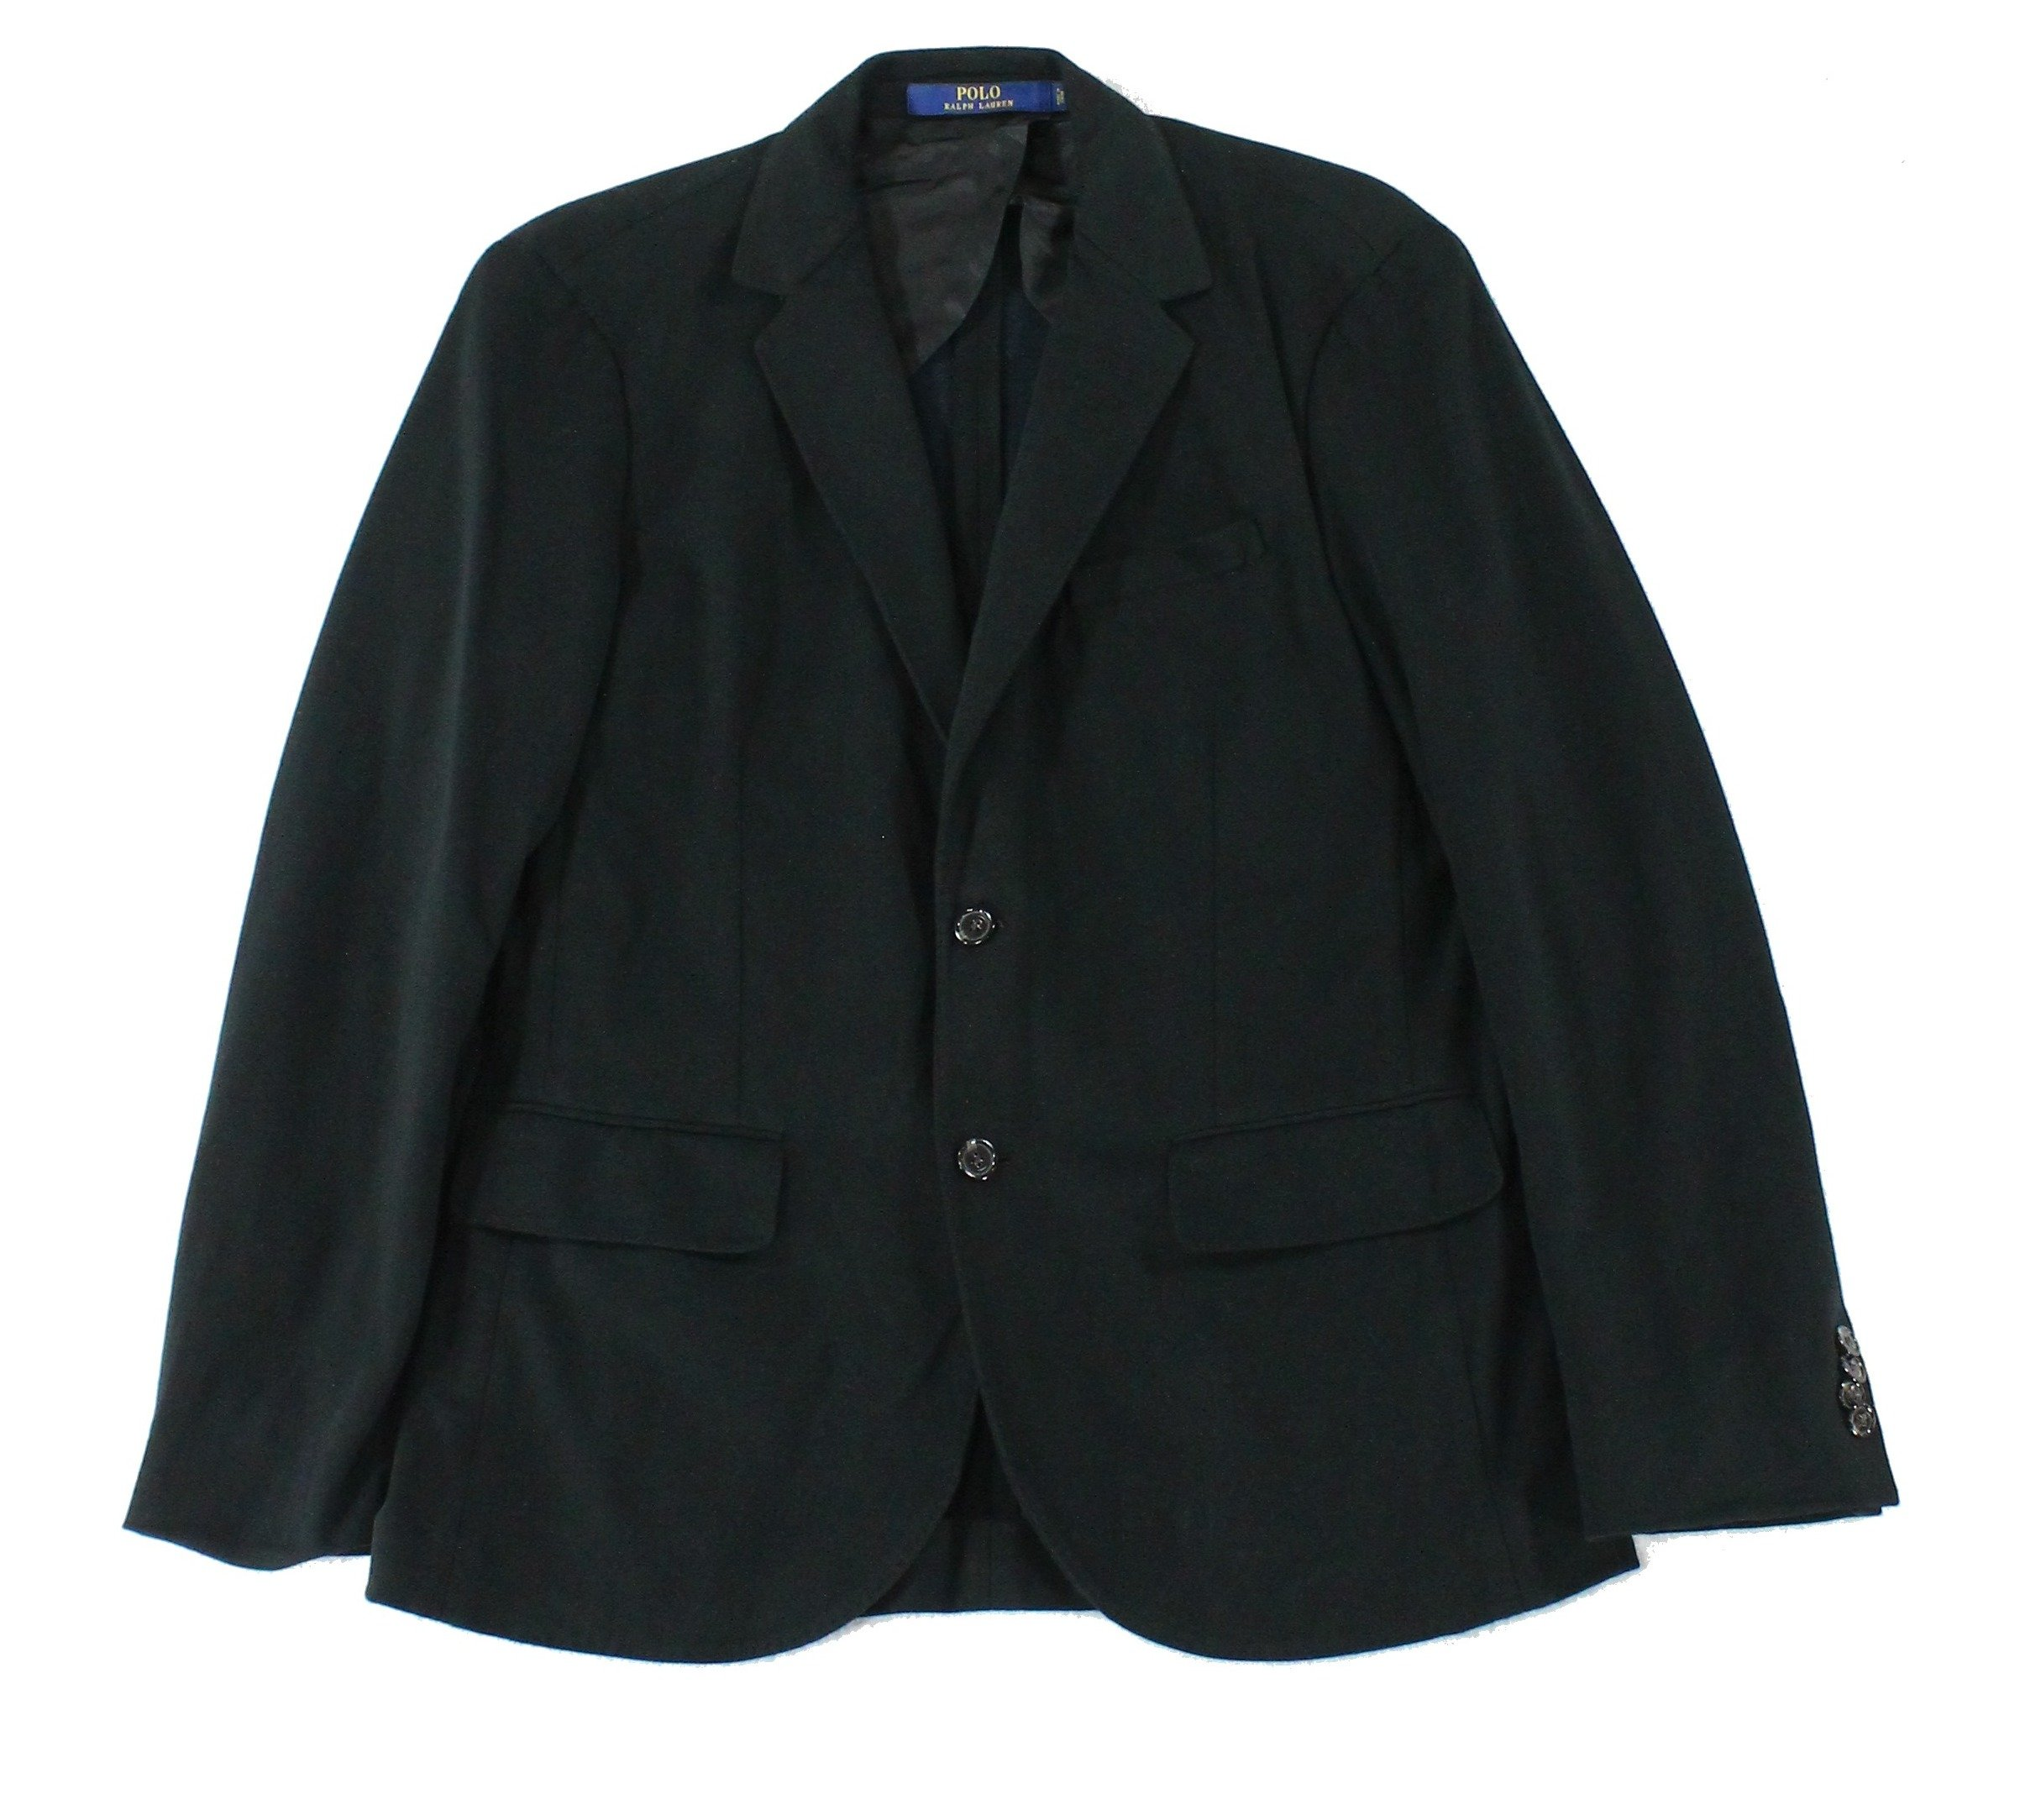 Polo Ralph Lauren Men's Knit Cotton-Blend Blazer (L)